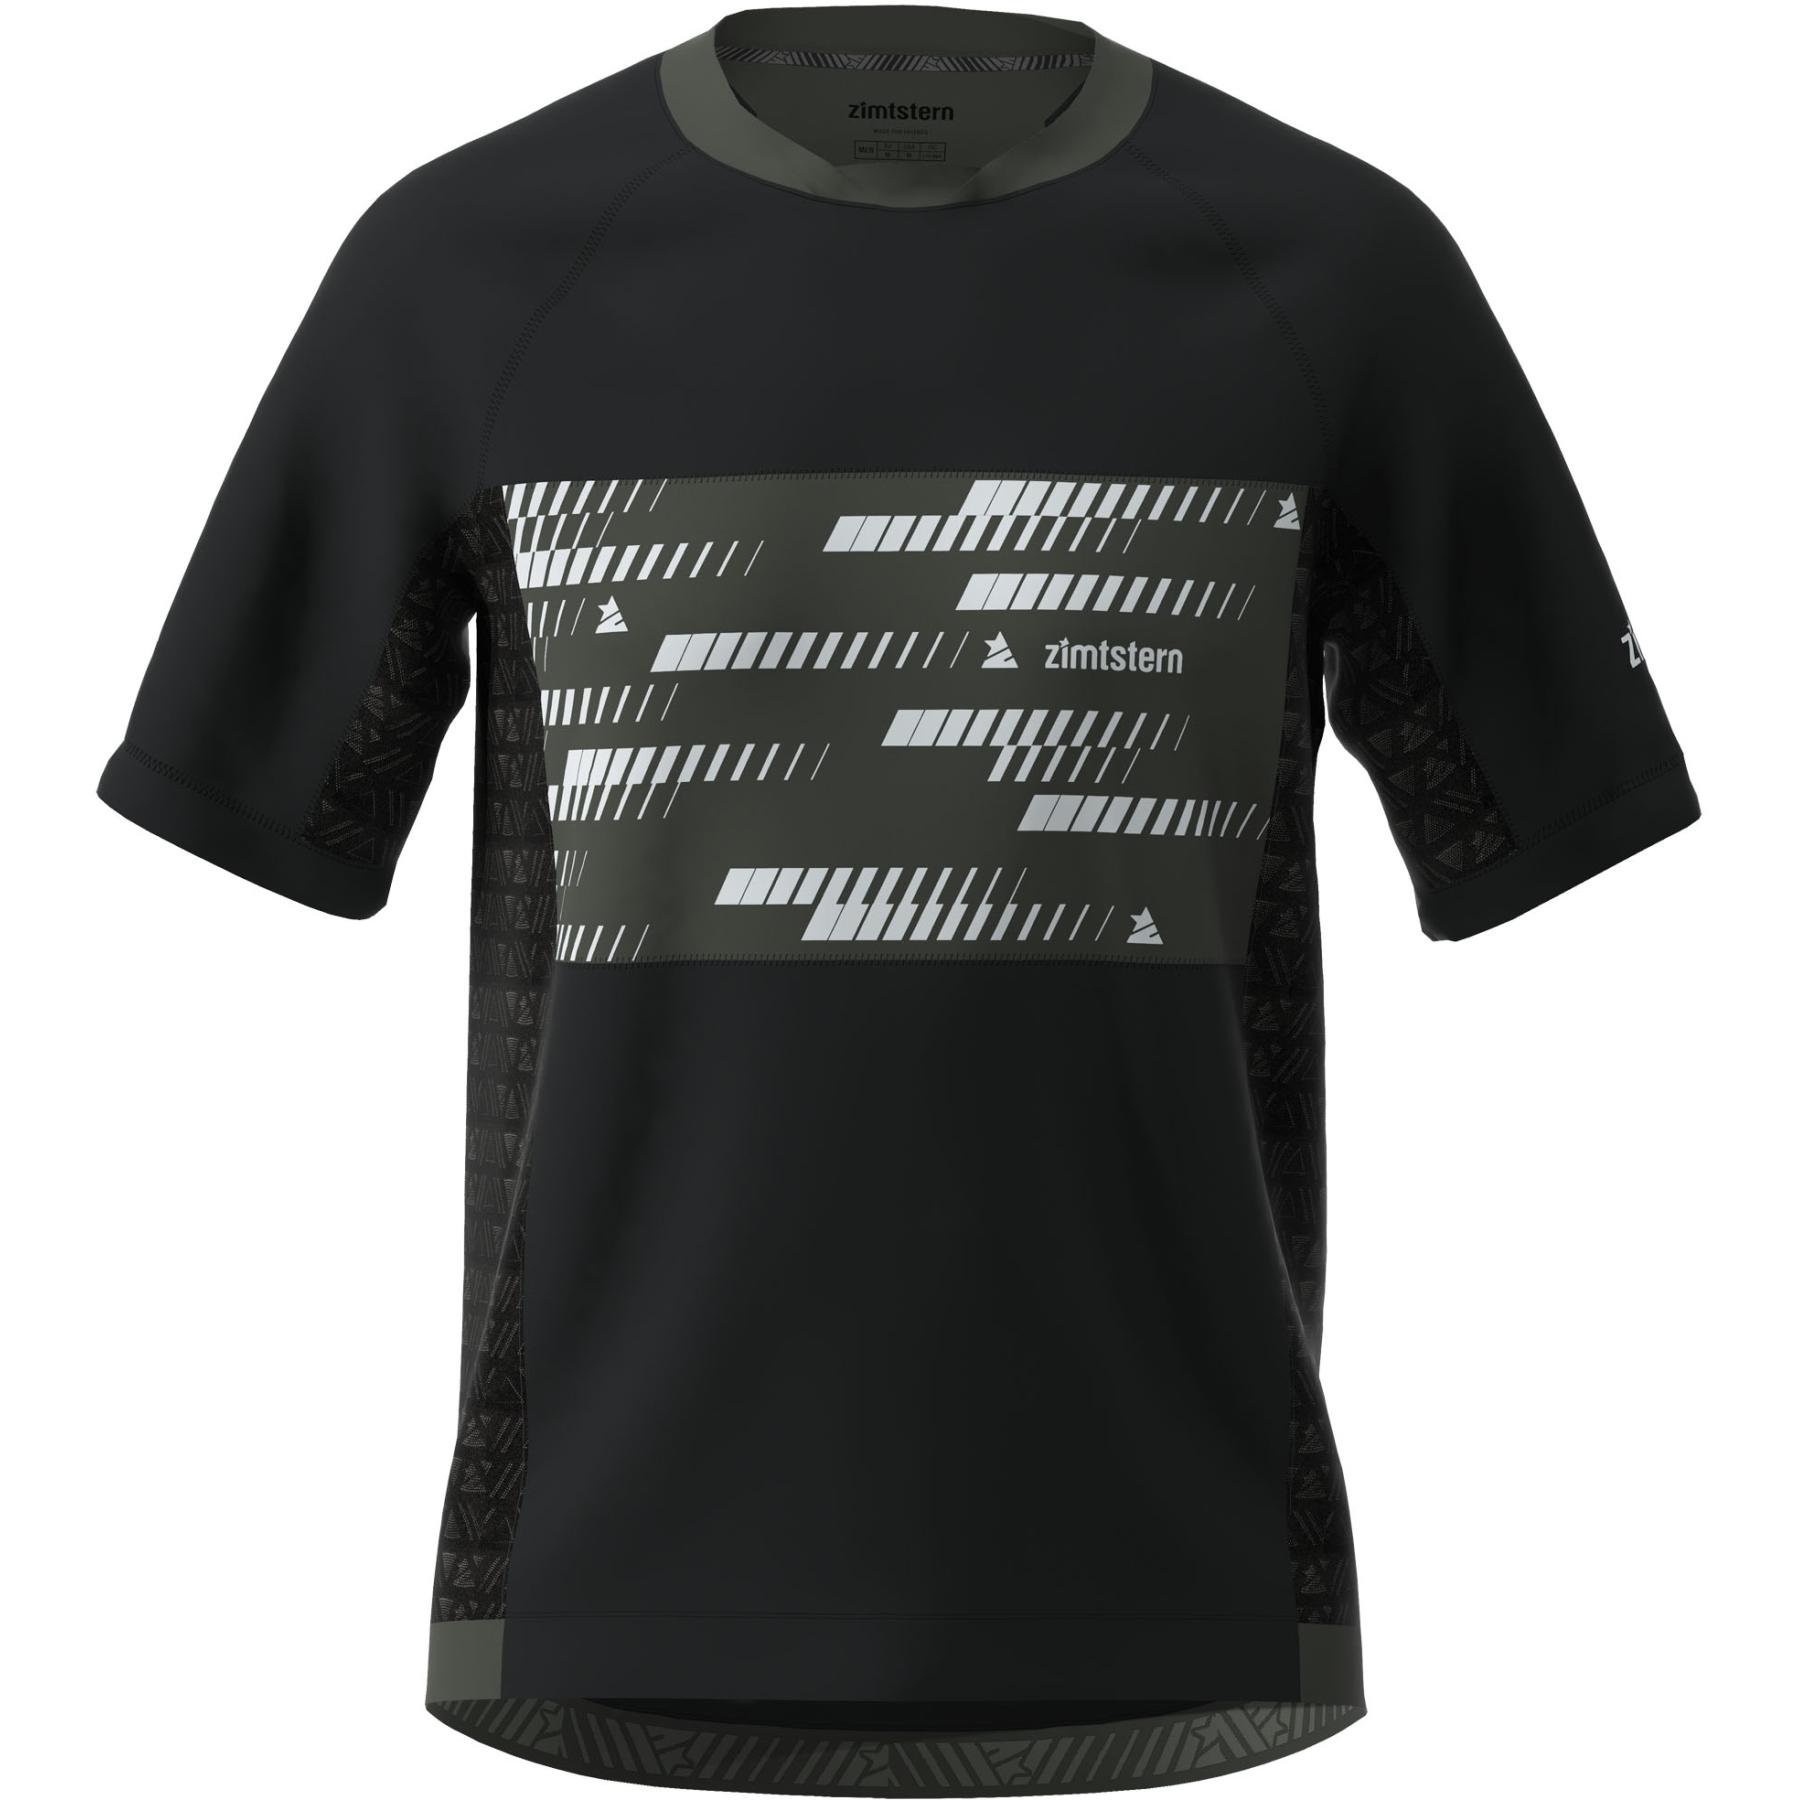 Zimtstern TechZonez Kurzarm-Shirt - pirate black/gun metal